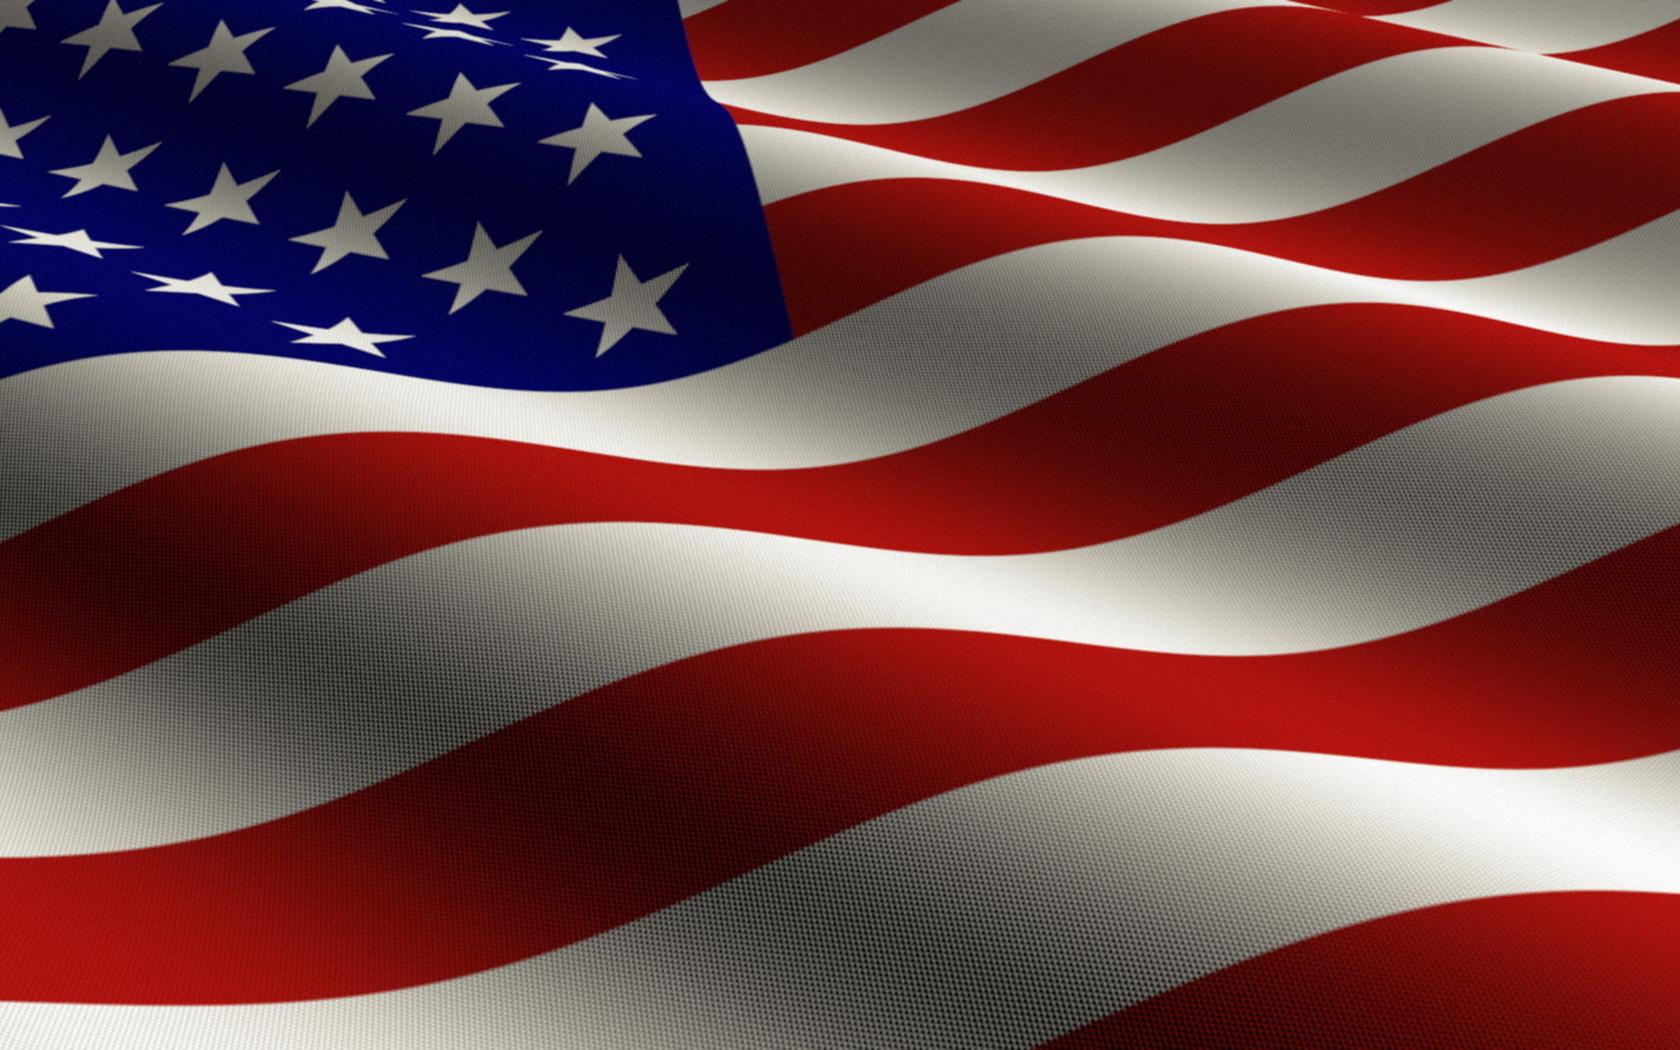 USA American Flag wallpaper 1680x1050 152556 WallpaperUP 1680x1050